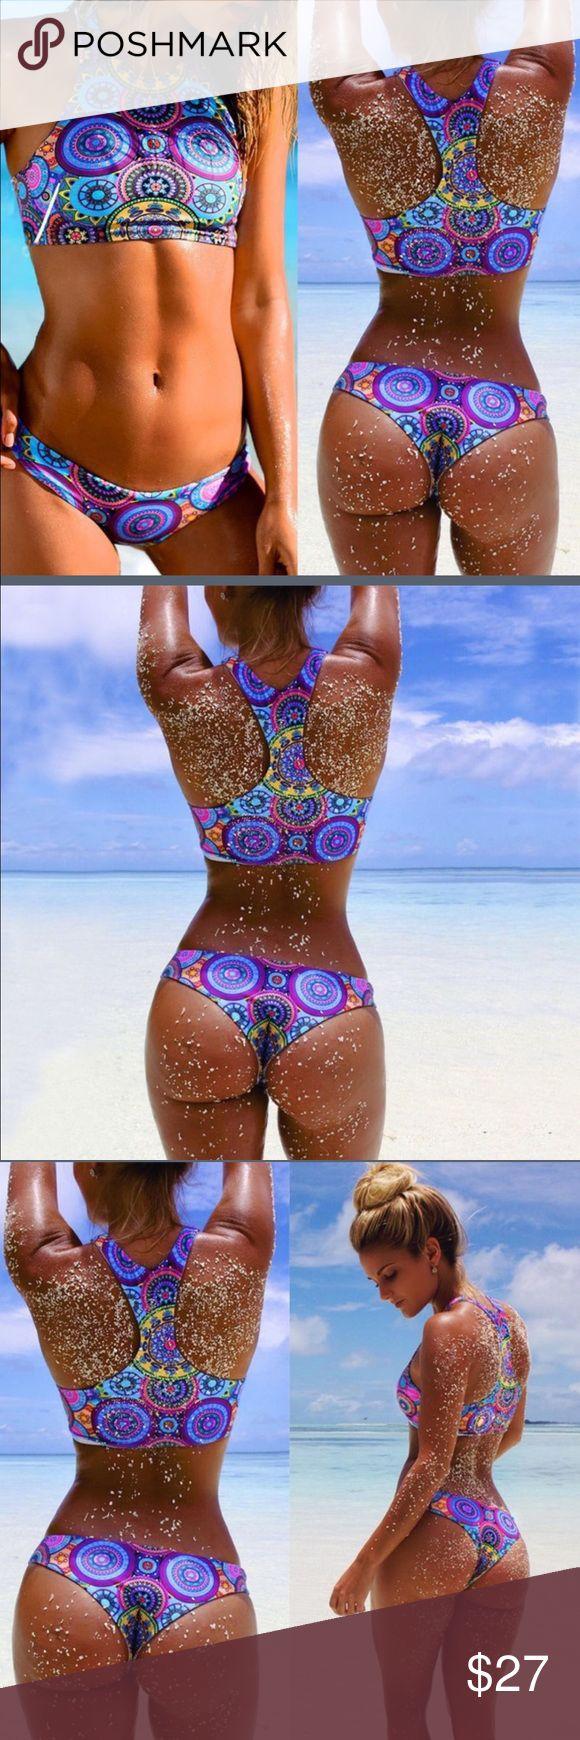 Sexy Woman Bandage Bikini Swimsuit Sexy Women Bandage Bikini Set Swimsuit Swimwear Bathing Suit 2pcs Set Floral Beachwear  Fashion design,100% Brand New,high quality! Material: 18% Spandex, 82% Polyamid Swim Bikinis